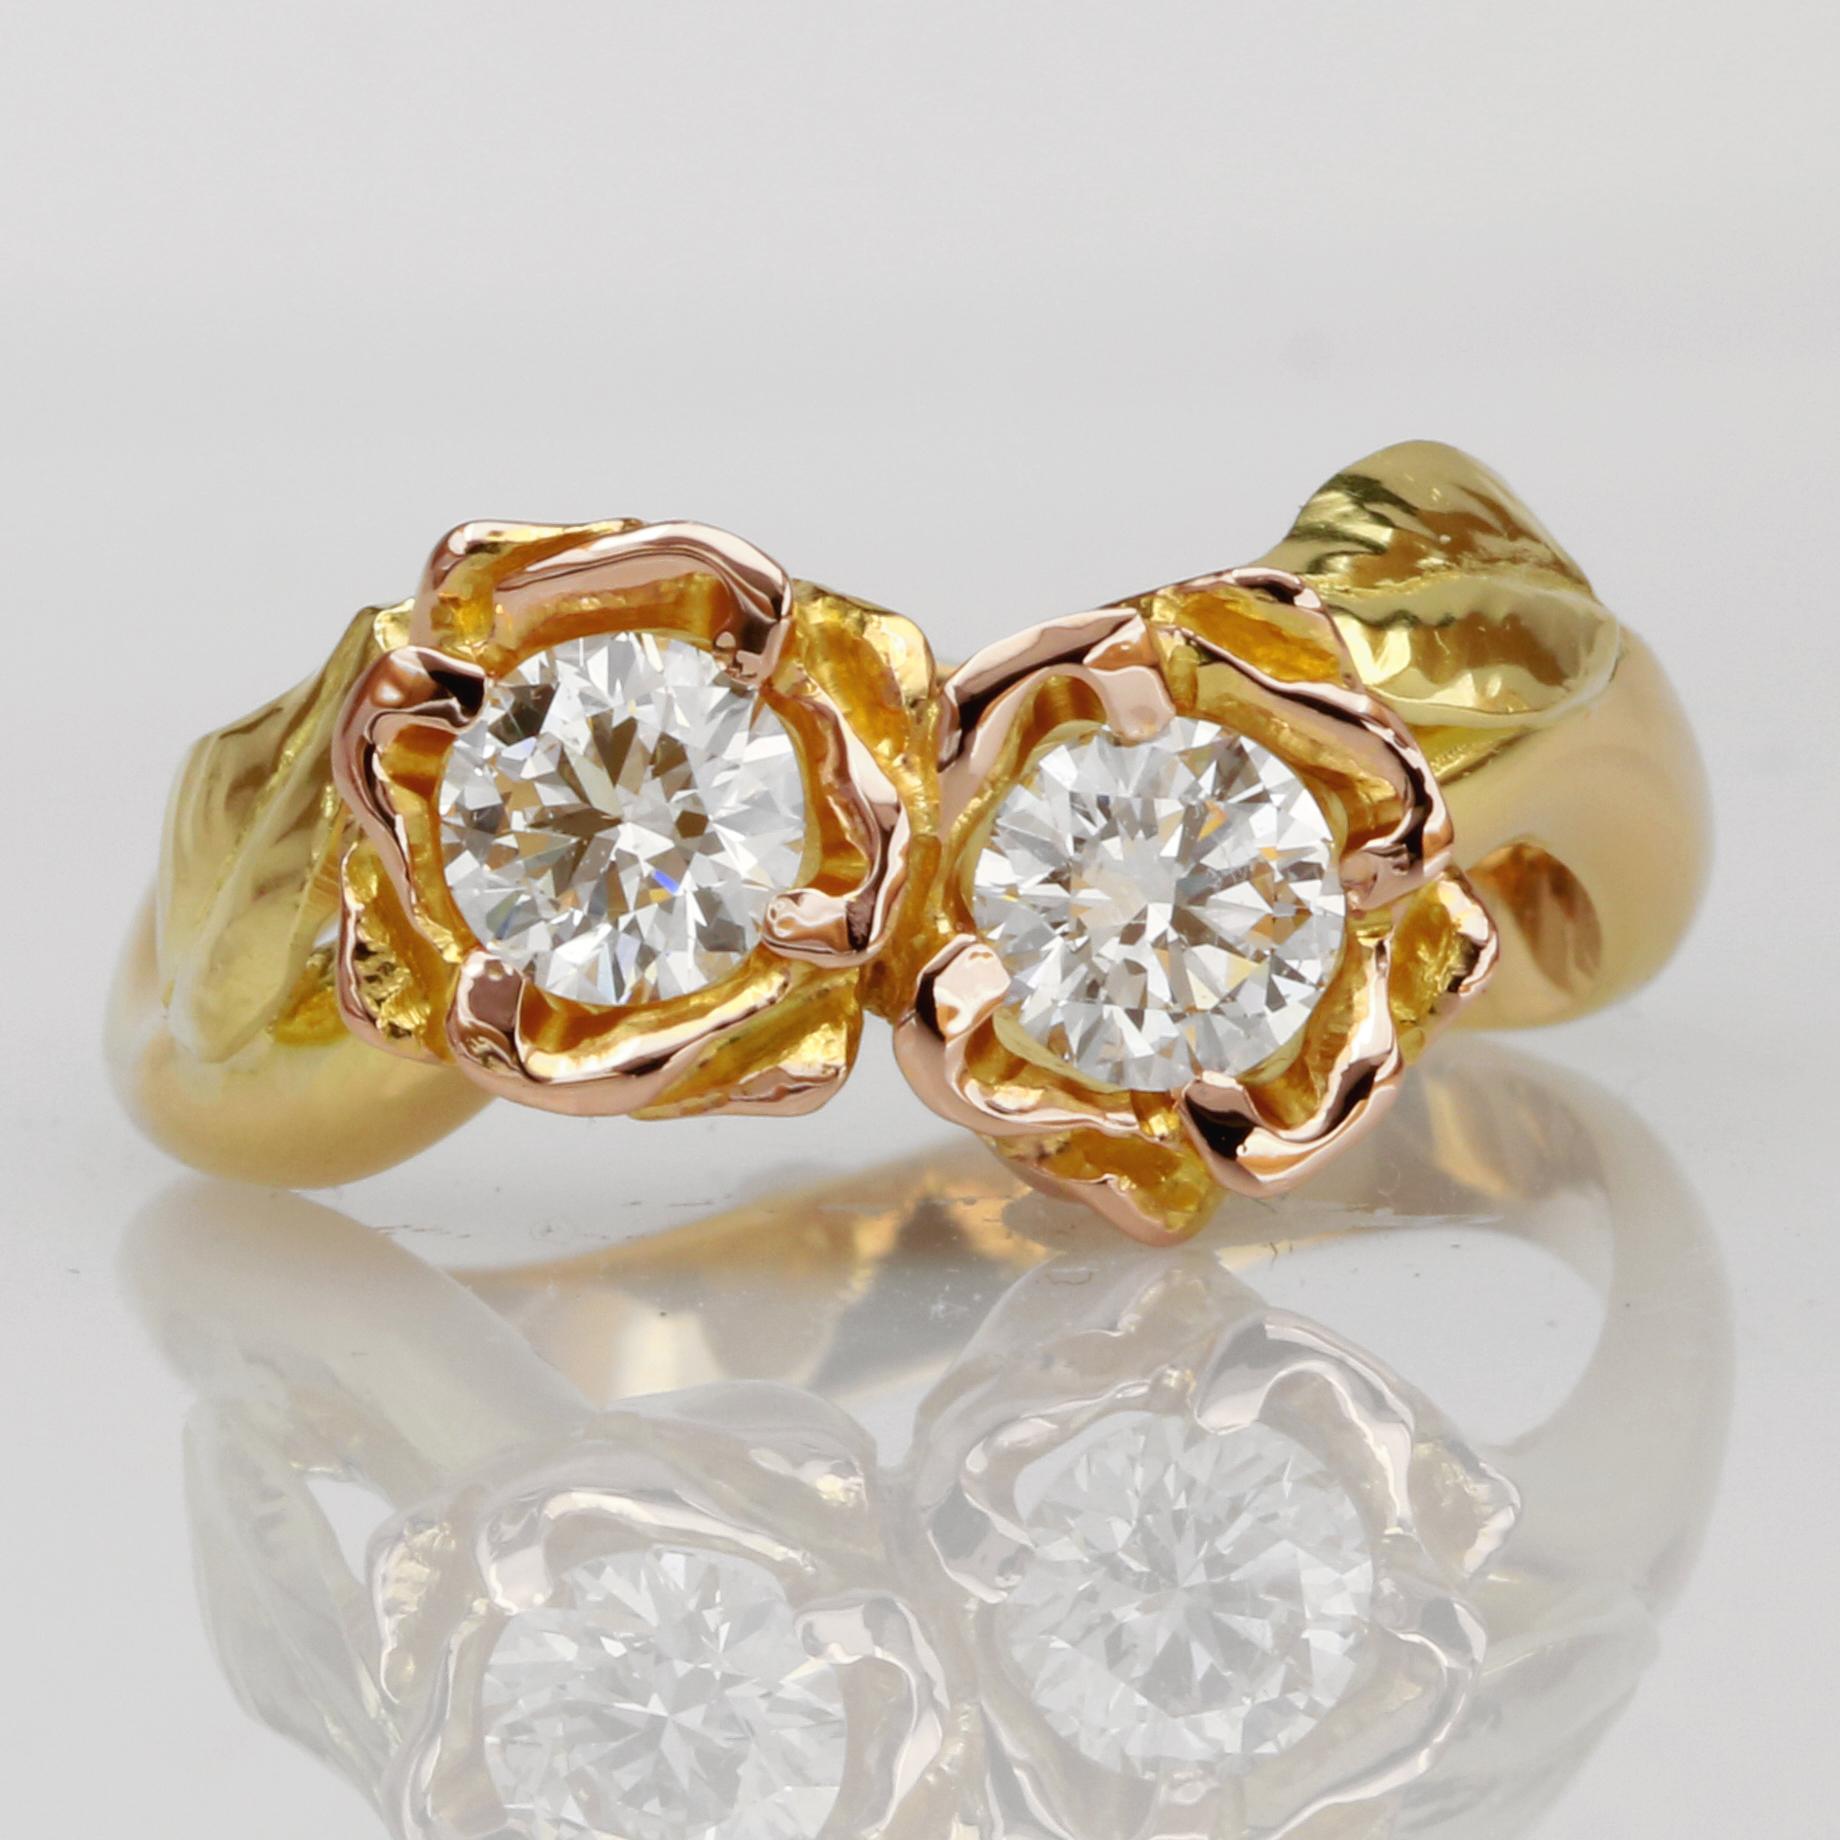 Handmade ladies 18ct yellow, rose and green gold diamond engagement ring